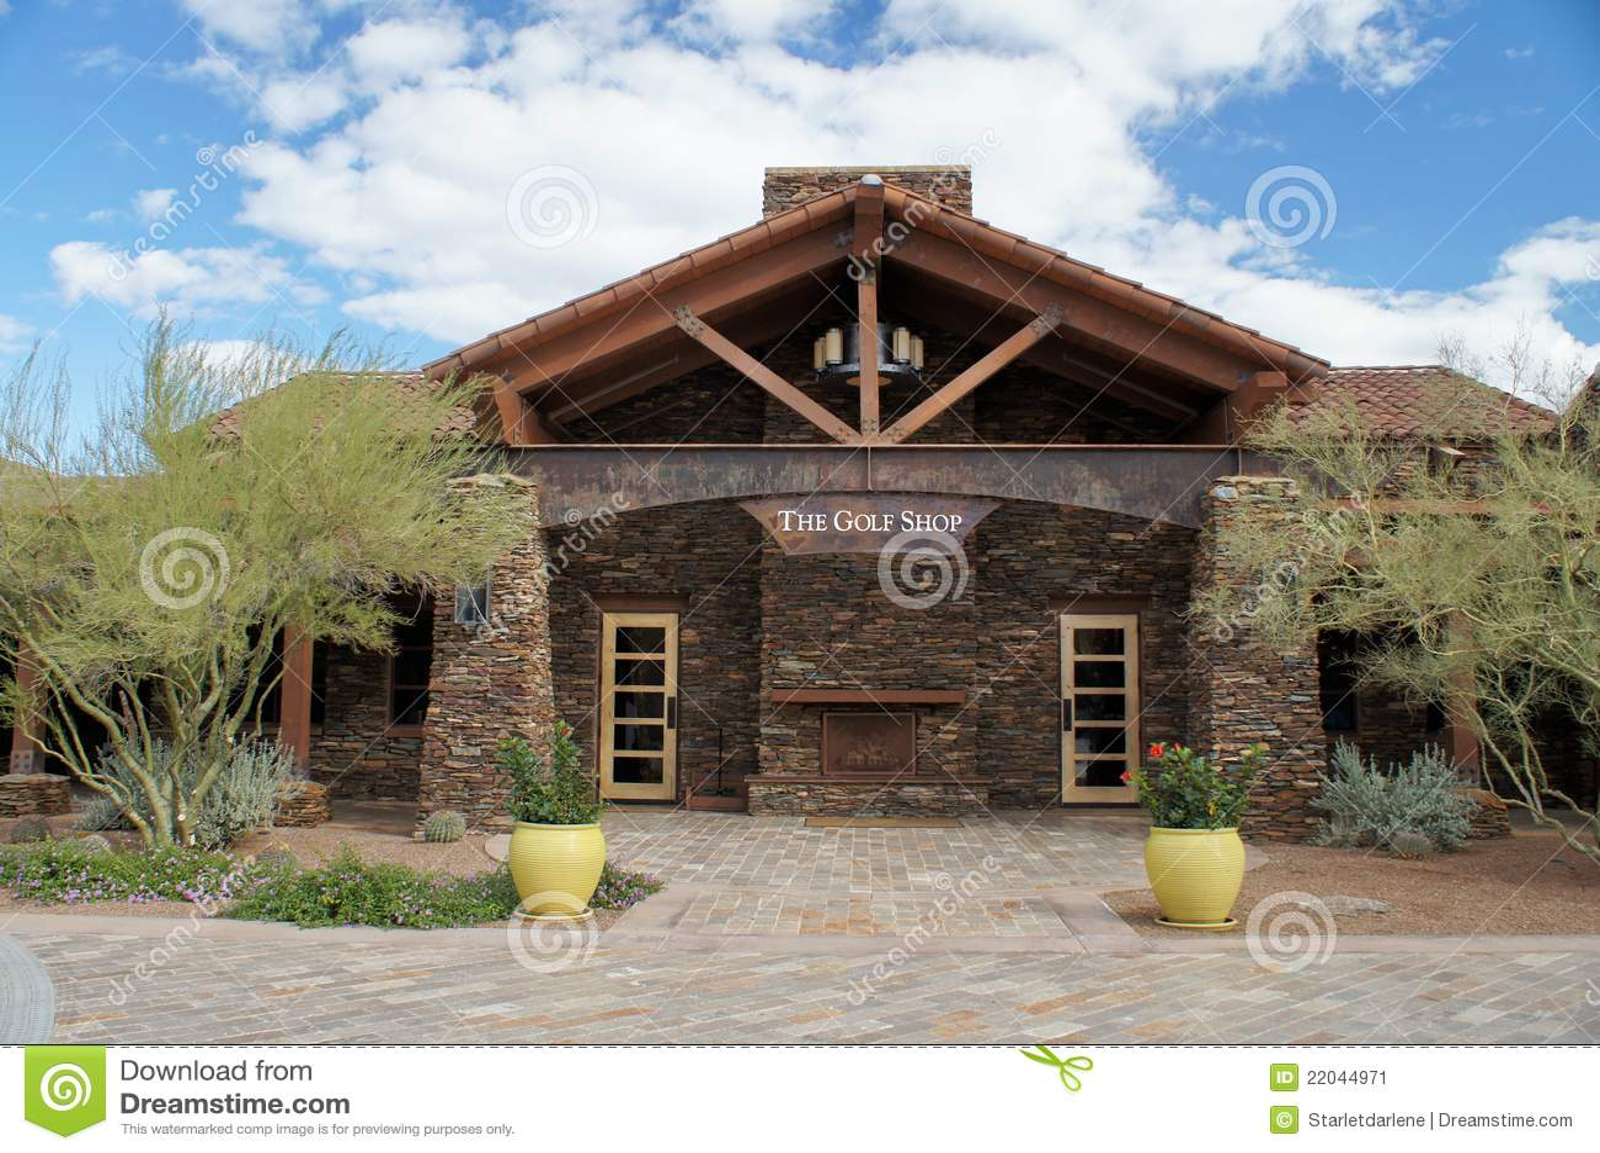 Golf Shop at Dove Mountain, Arizona